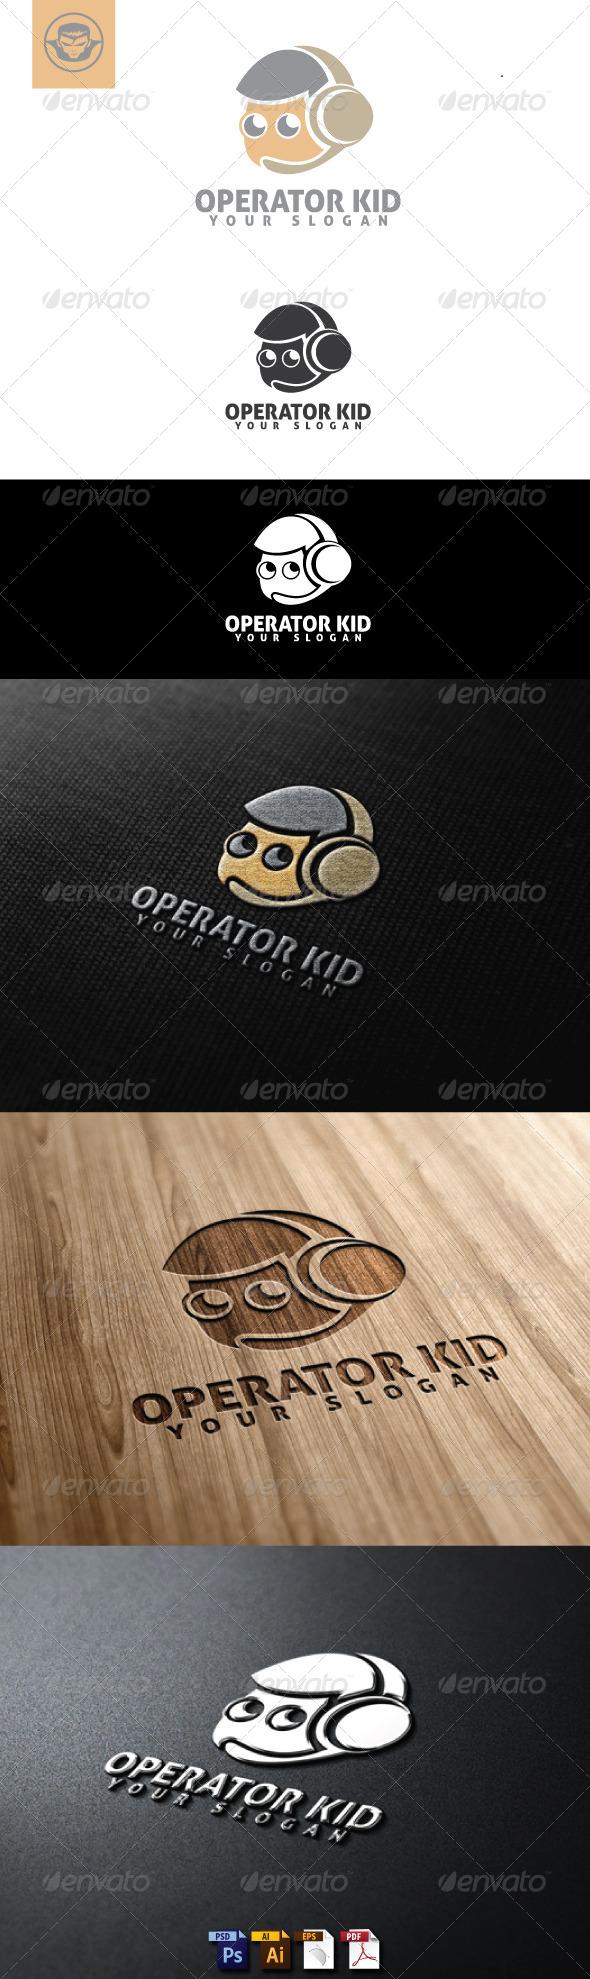 GraphicRiver Operator Kid Logo Template 4884850